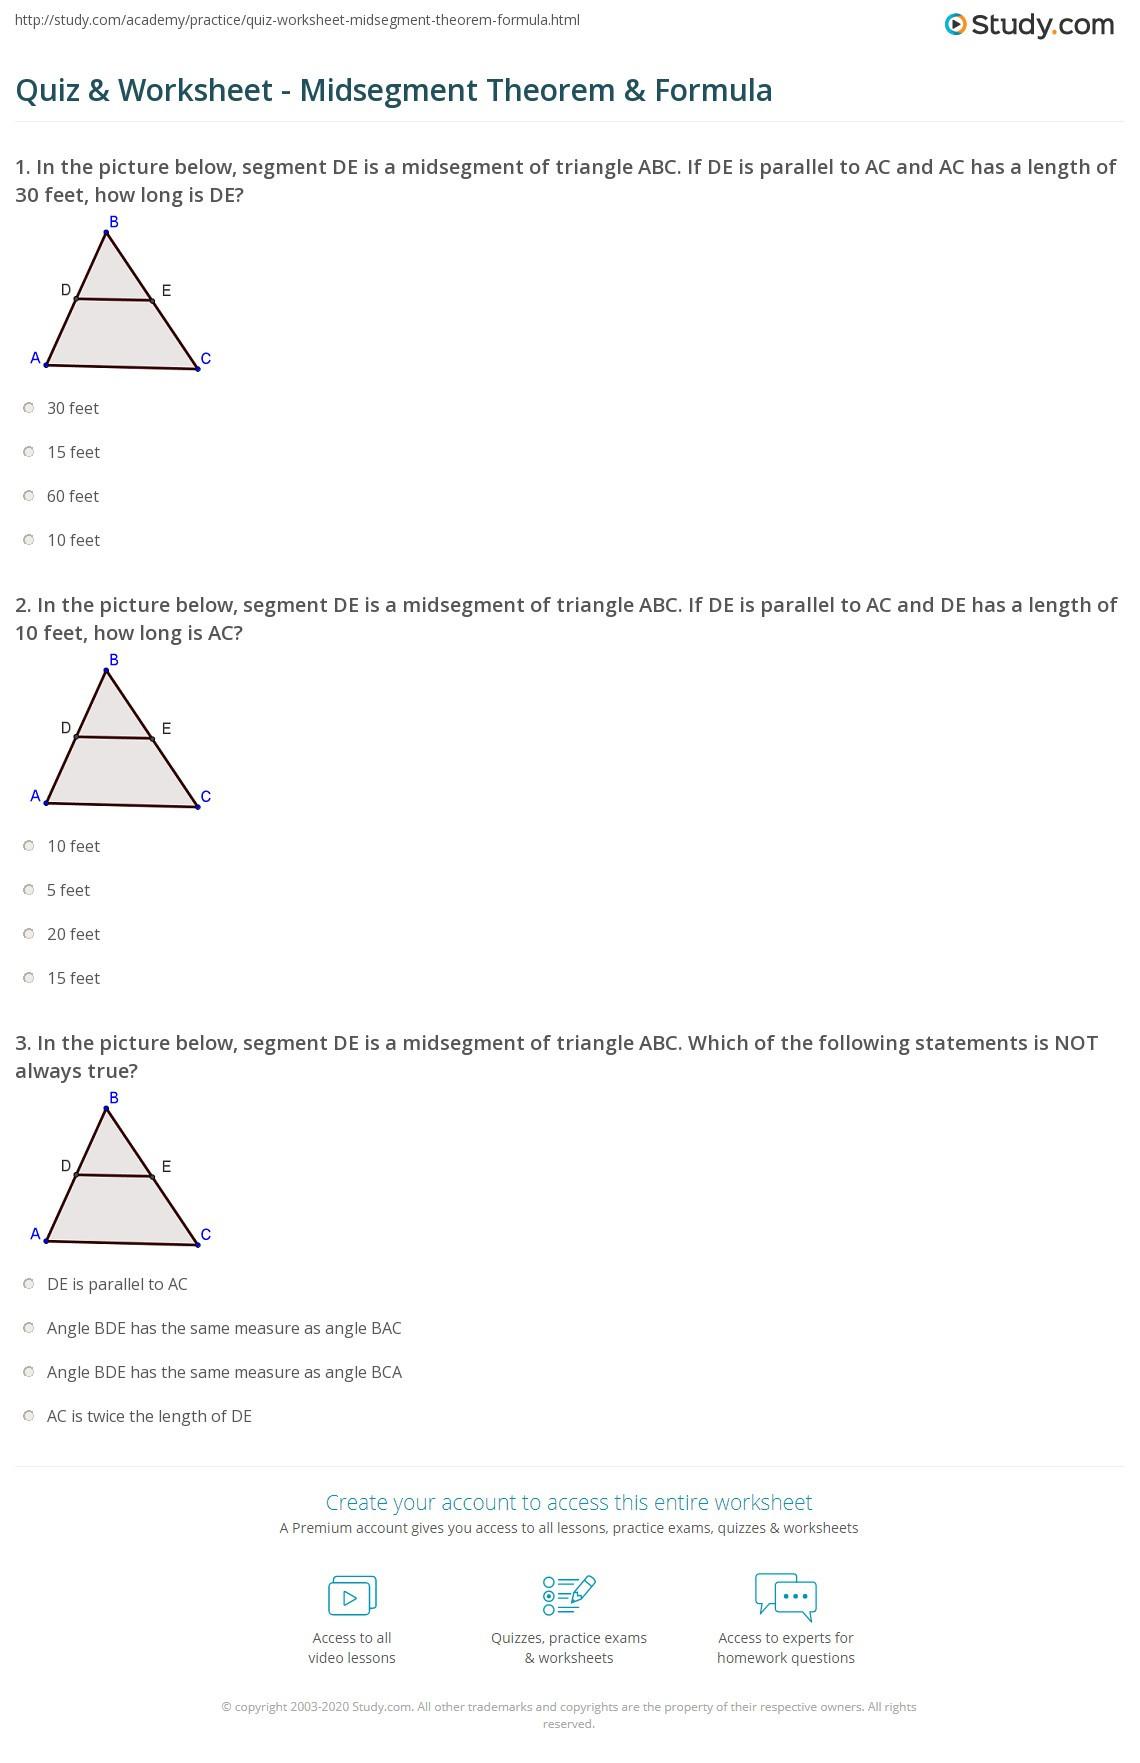 Midsegment theorem Worksheet Answer Key Quiz & Worksheet Midsegment theorem & formula